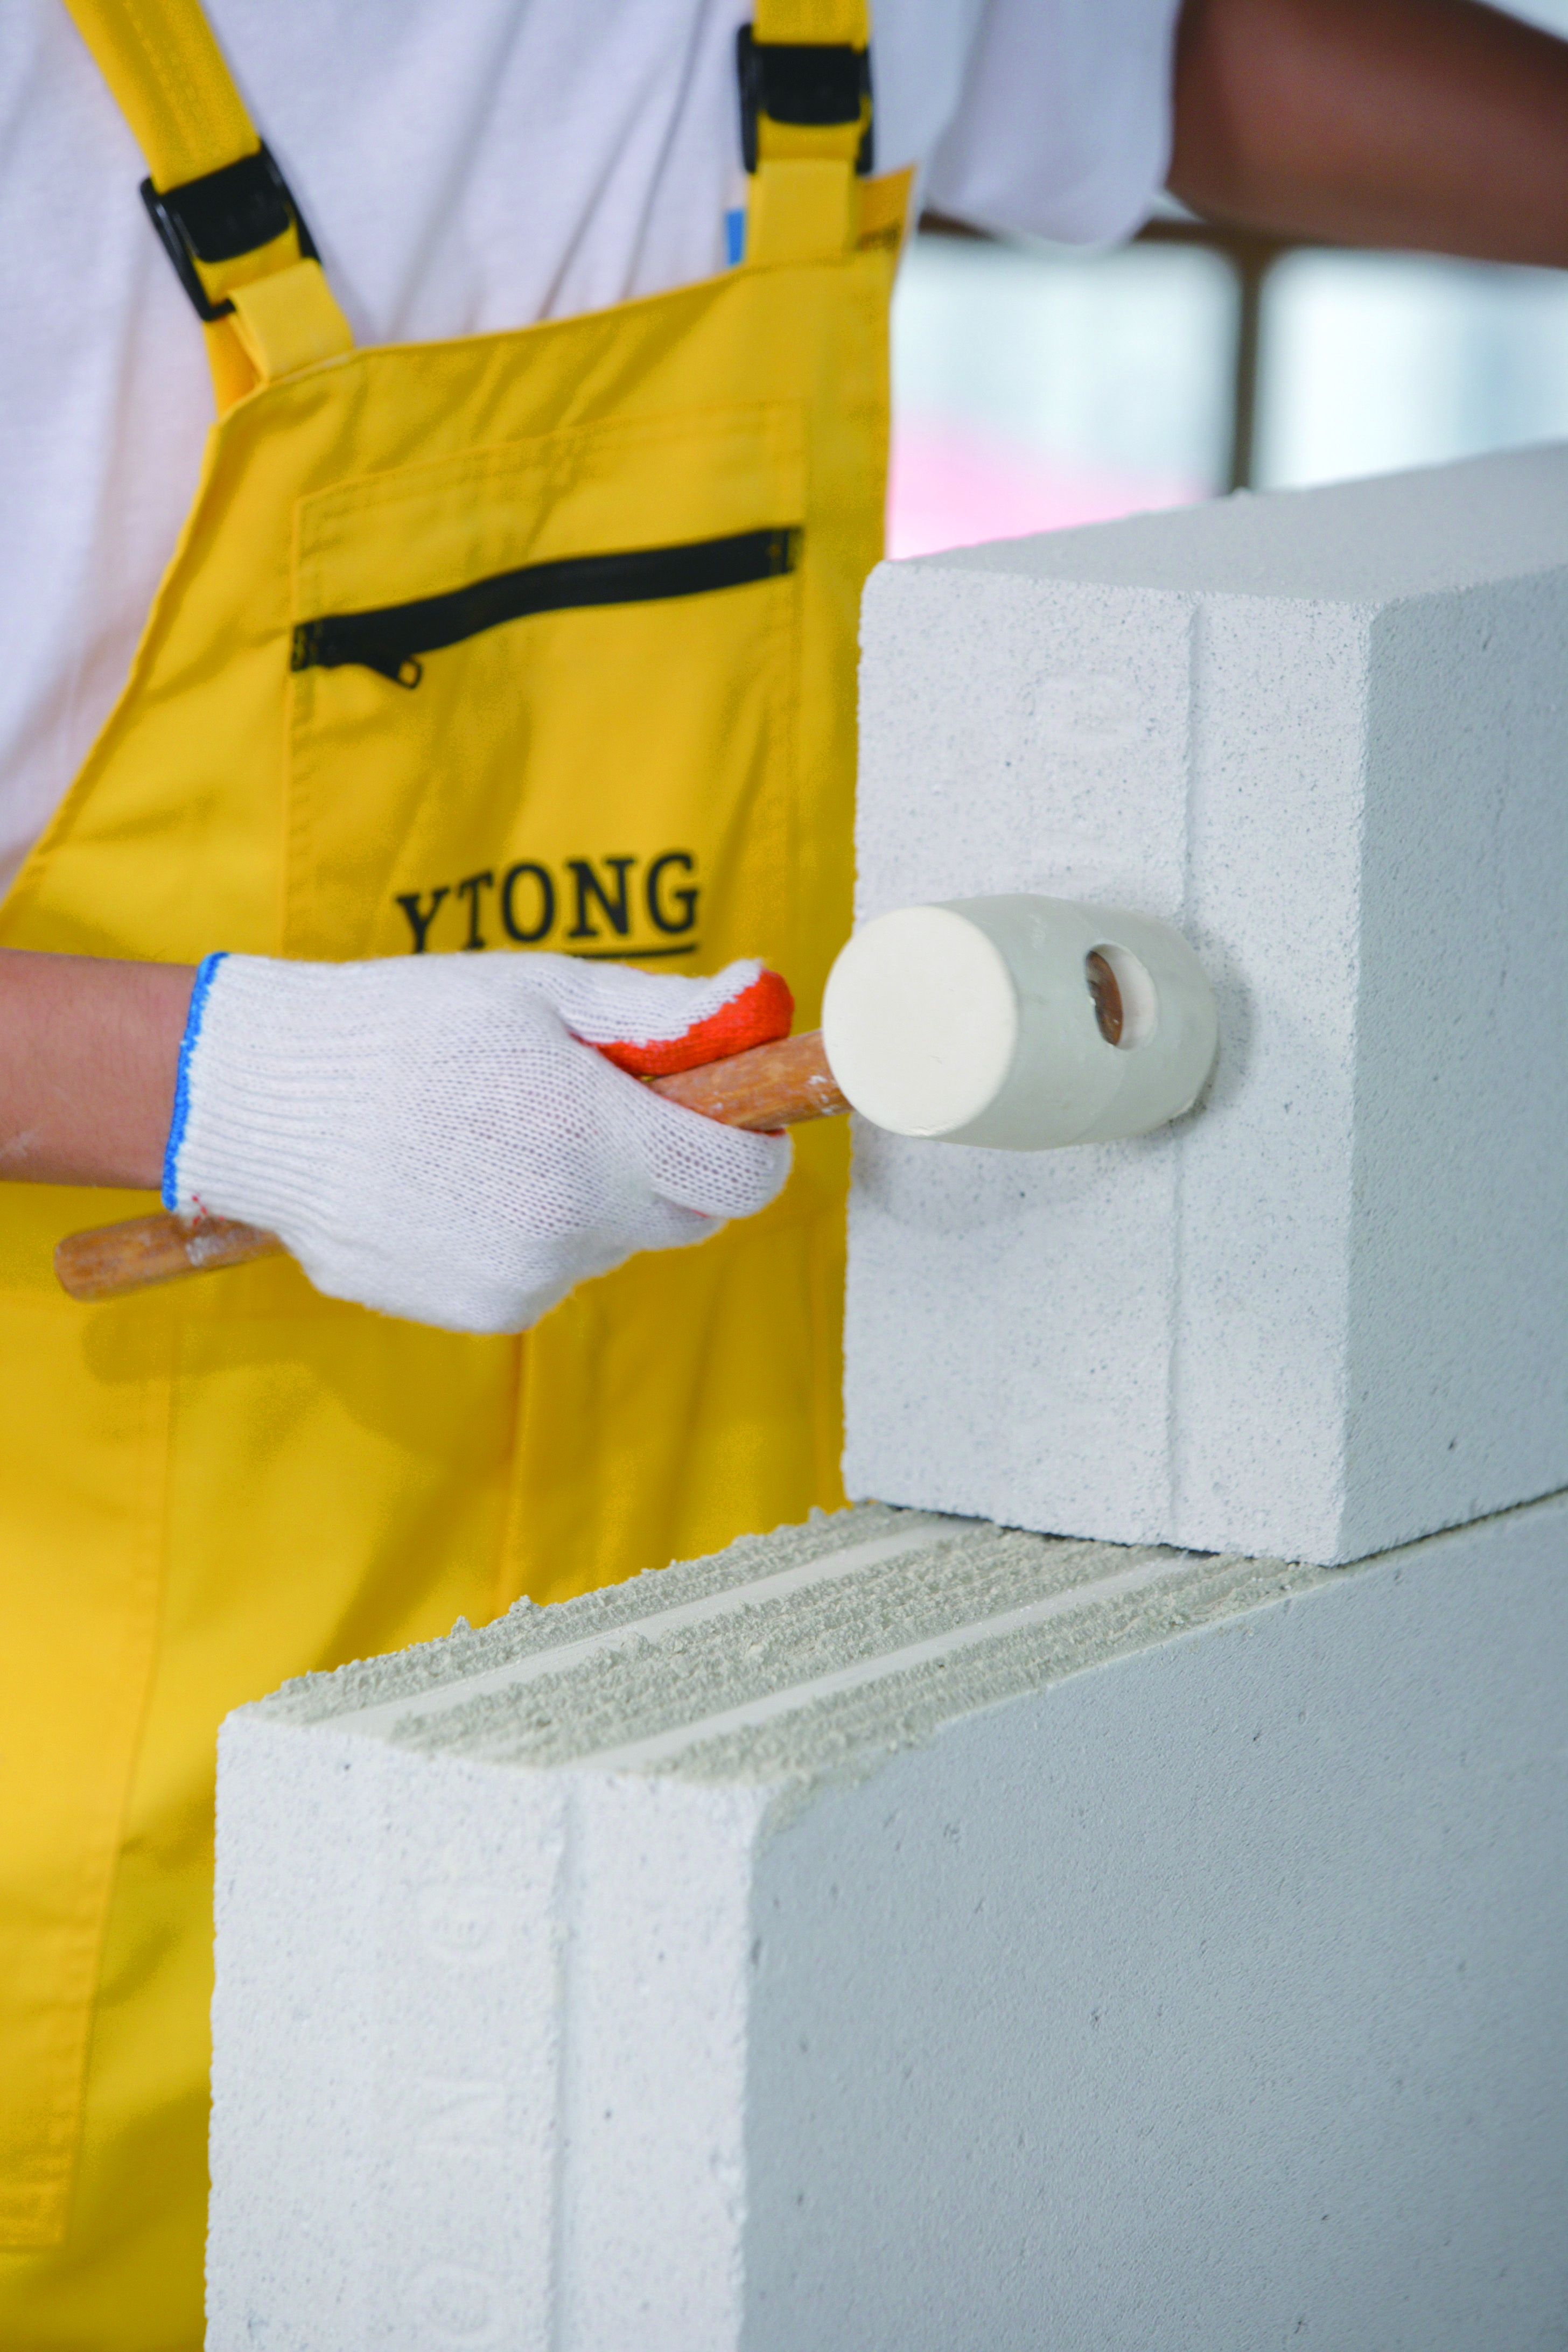 Xella Srbija, proizvodnja gradjevinskih materijala, ytong blokovi za pregradne zidove